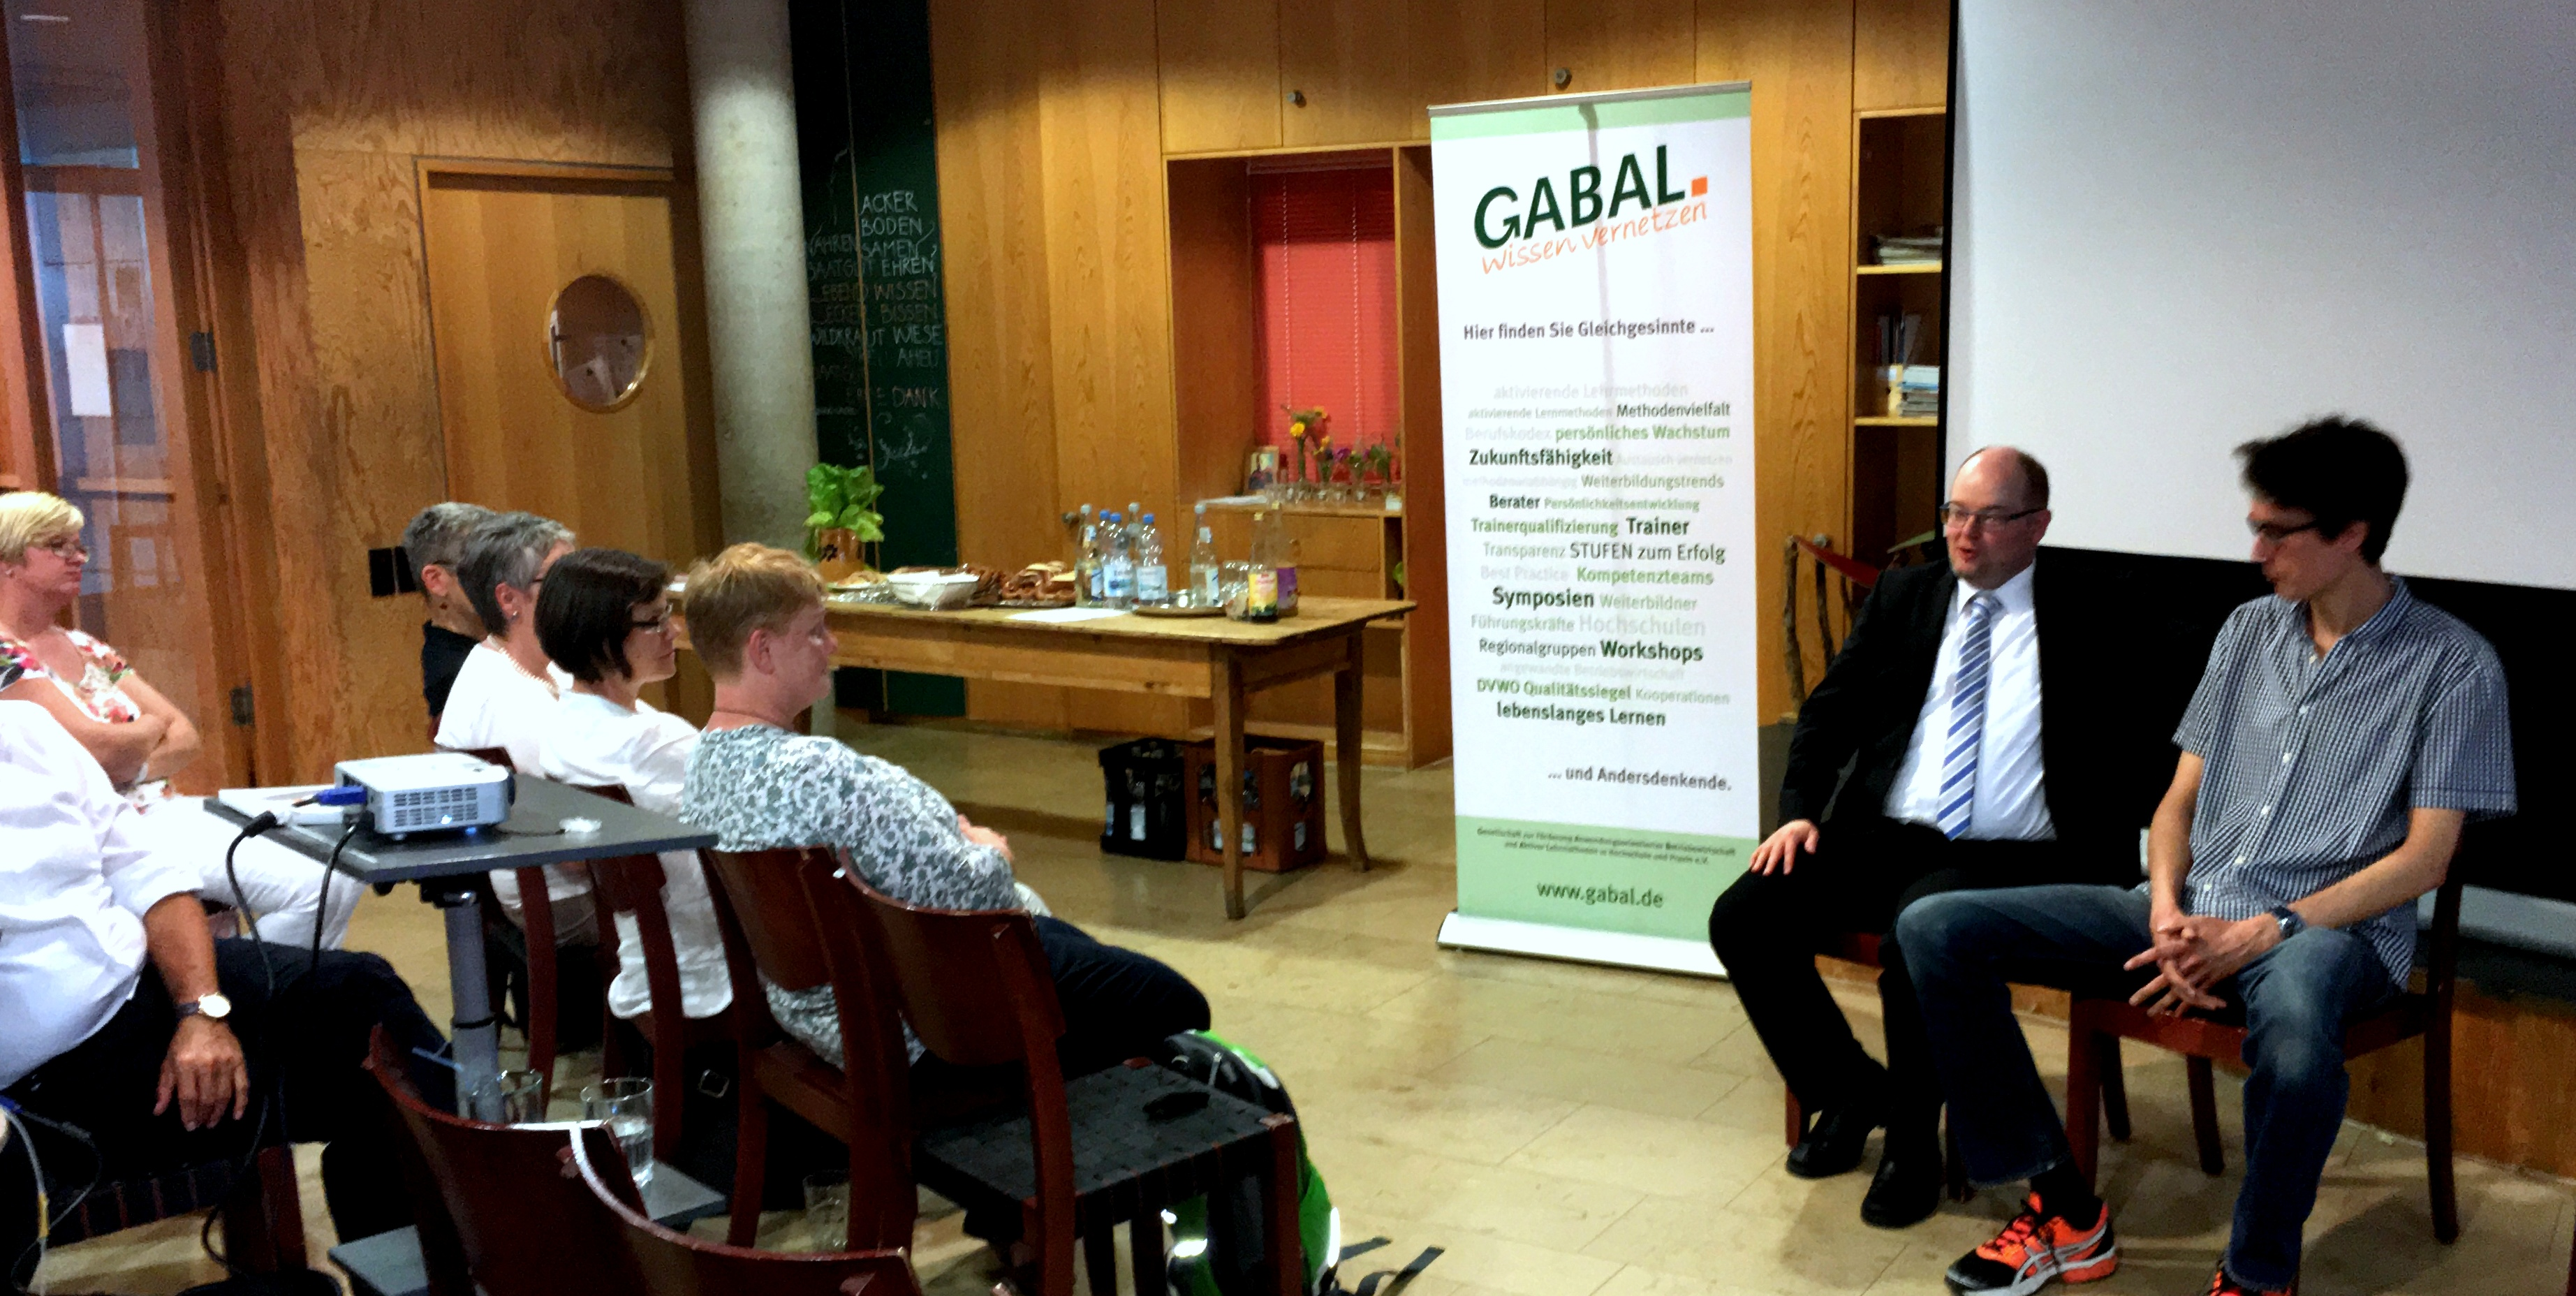 Rhetorik-und-Kommunikation-bei-GABAL-Stuttgart